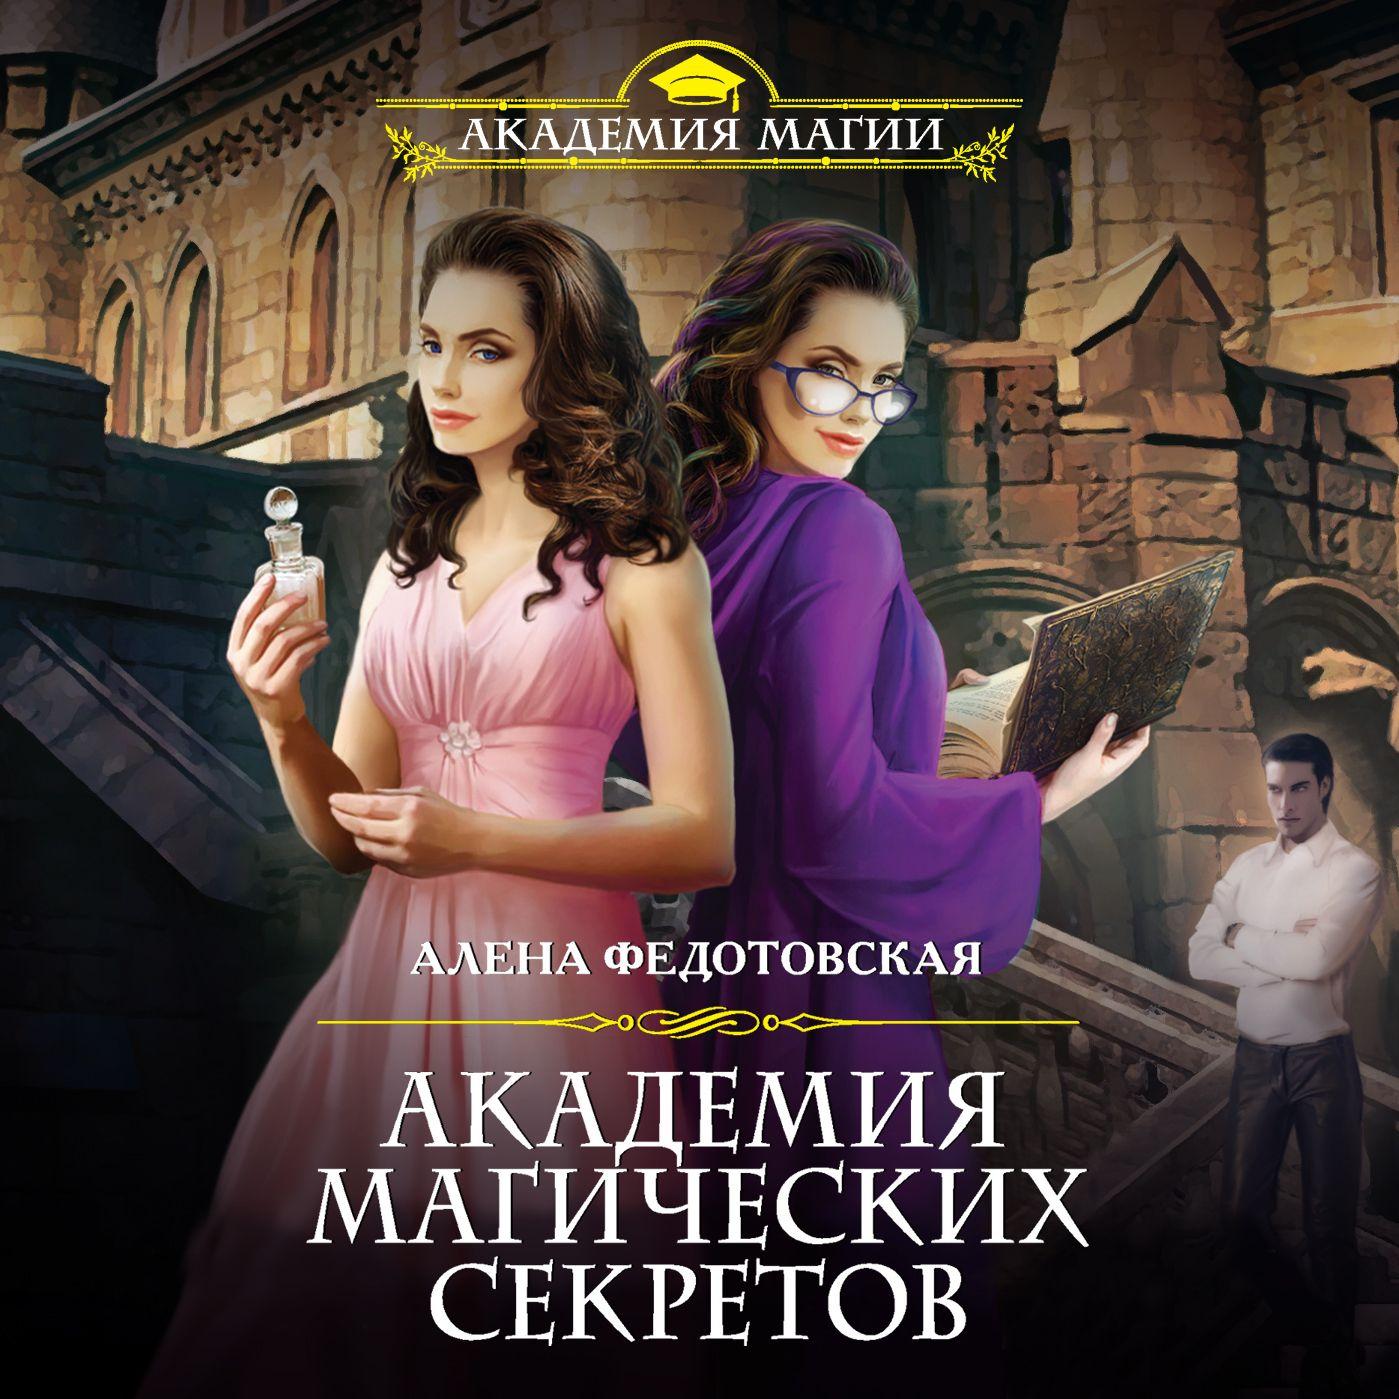 Алена Федотовская Академия магических секретов цена 2017